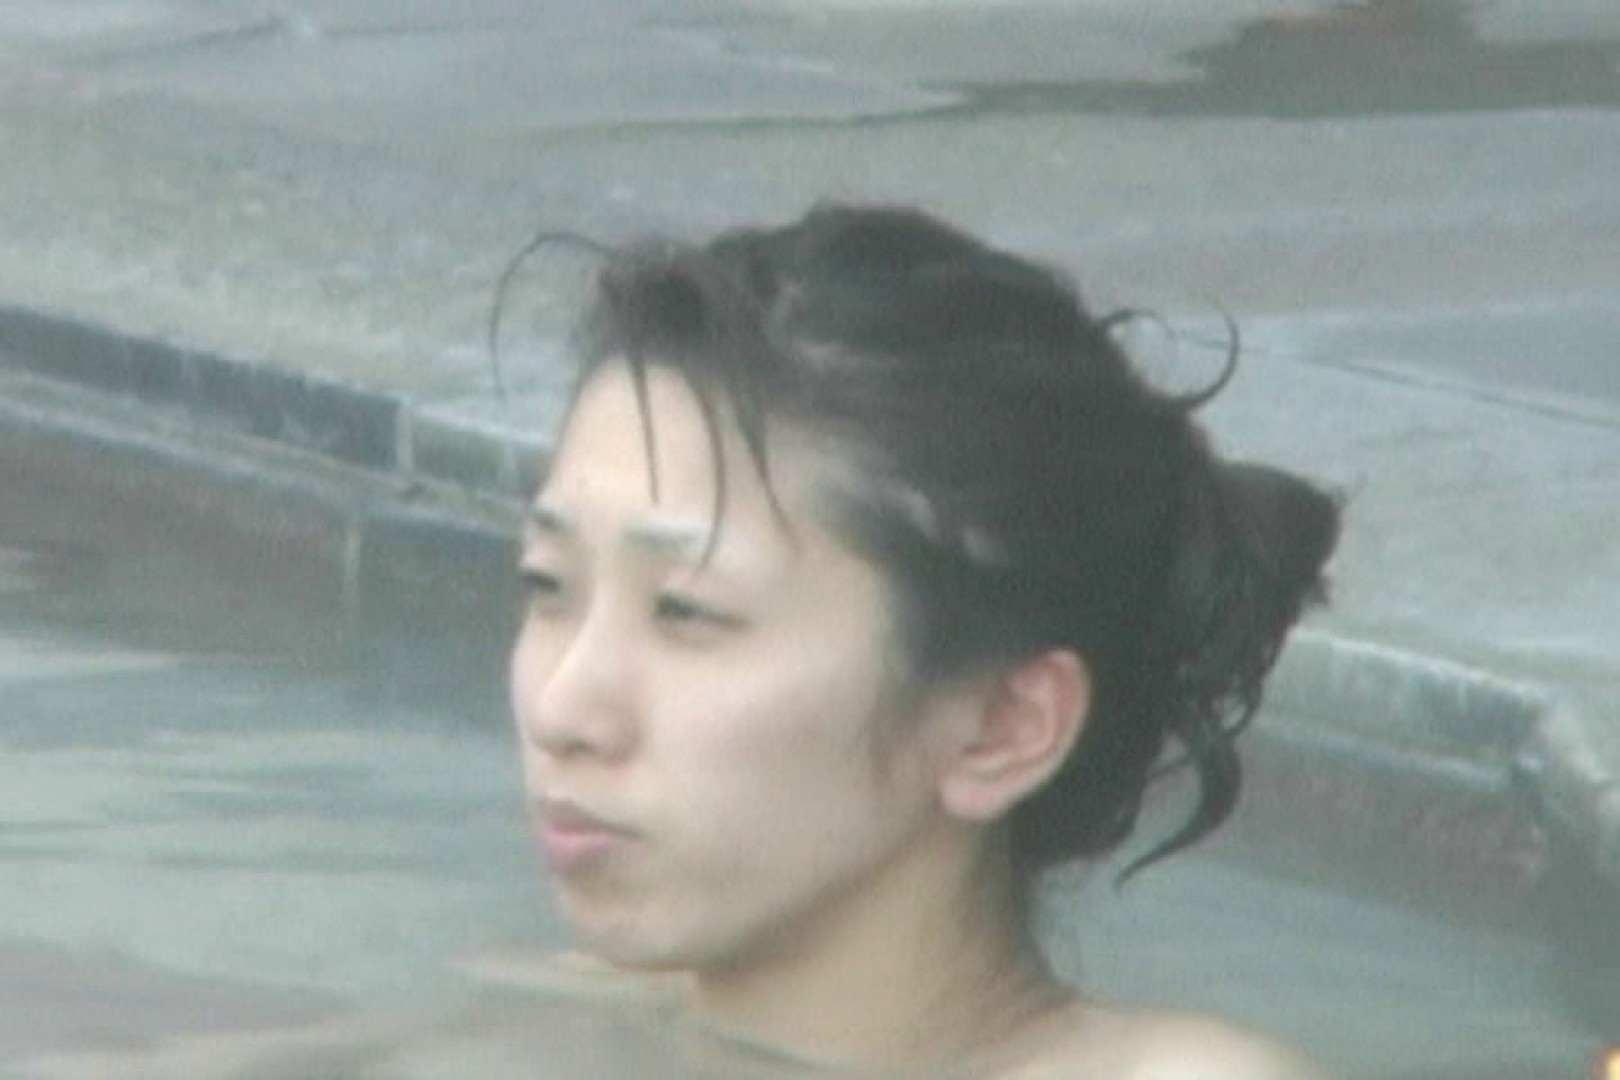 Aquaな露天風呂Vol.588 HなOL | 盗撮  66pic 39